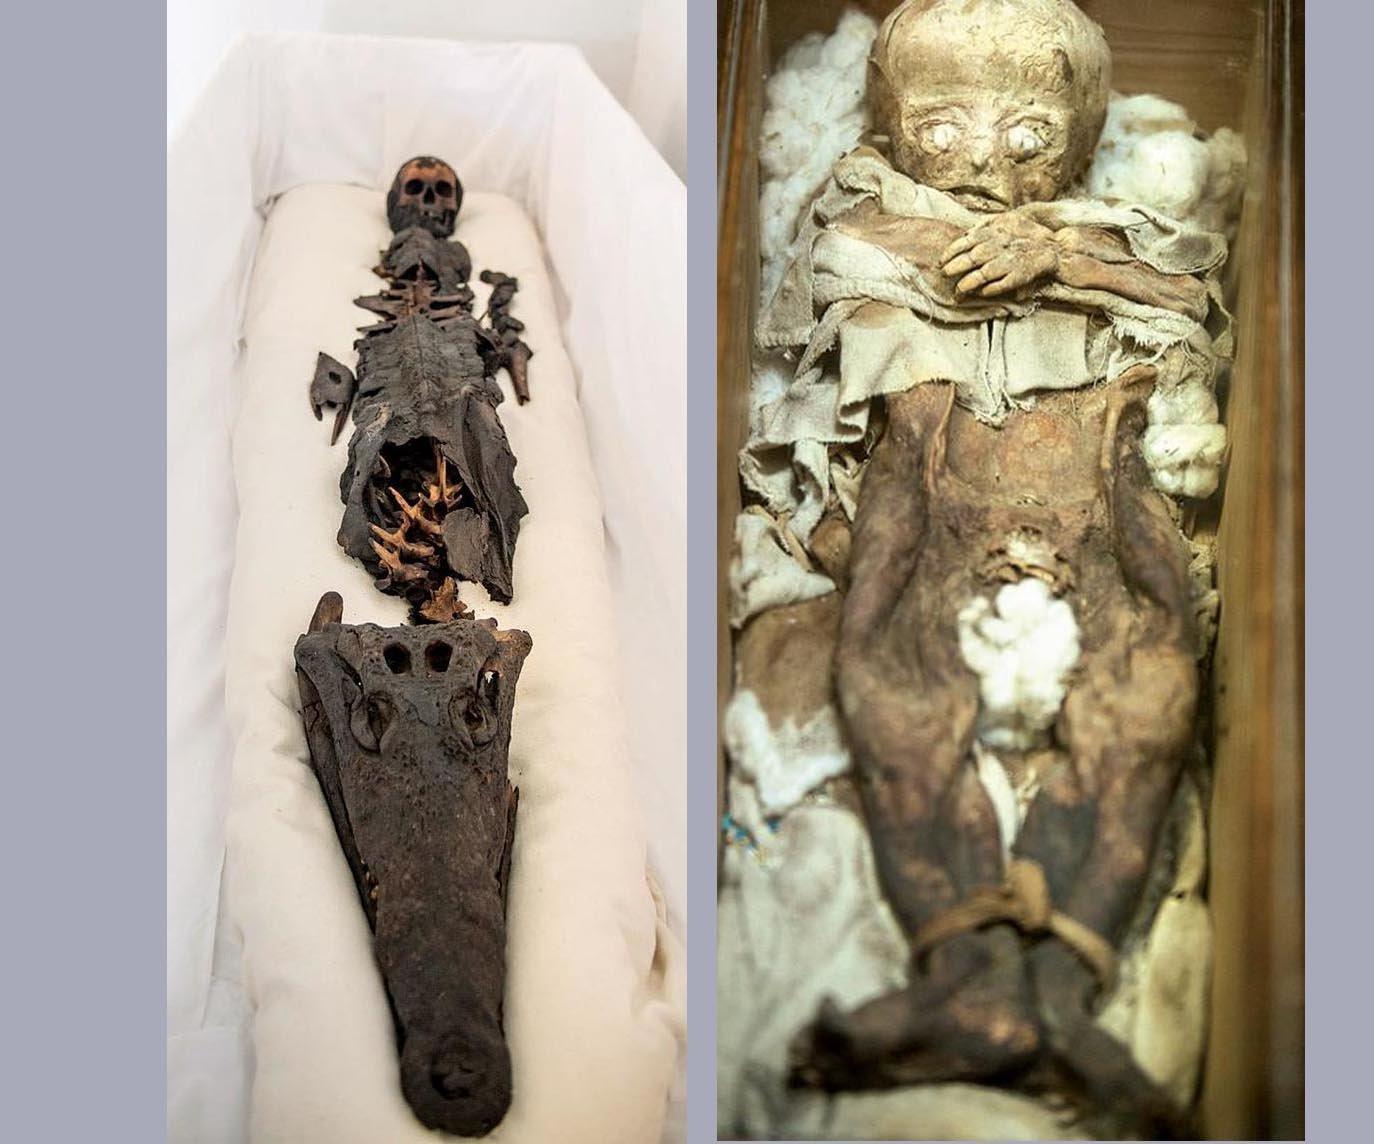 Half princess half crocodile: Two-headed ancient mummy revealed to